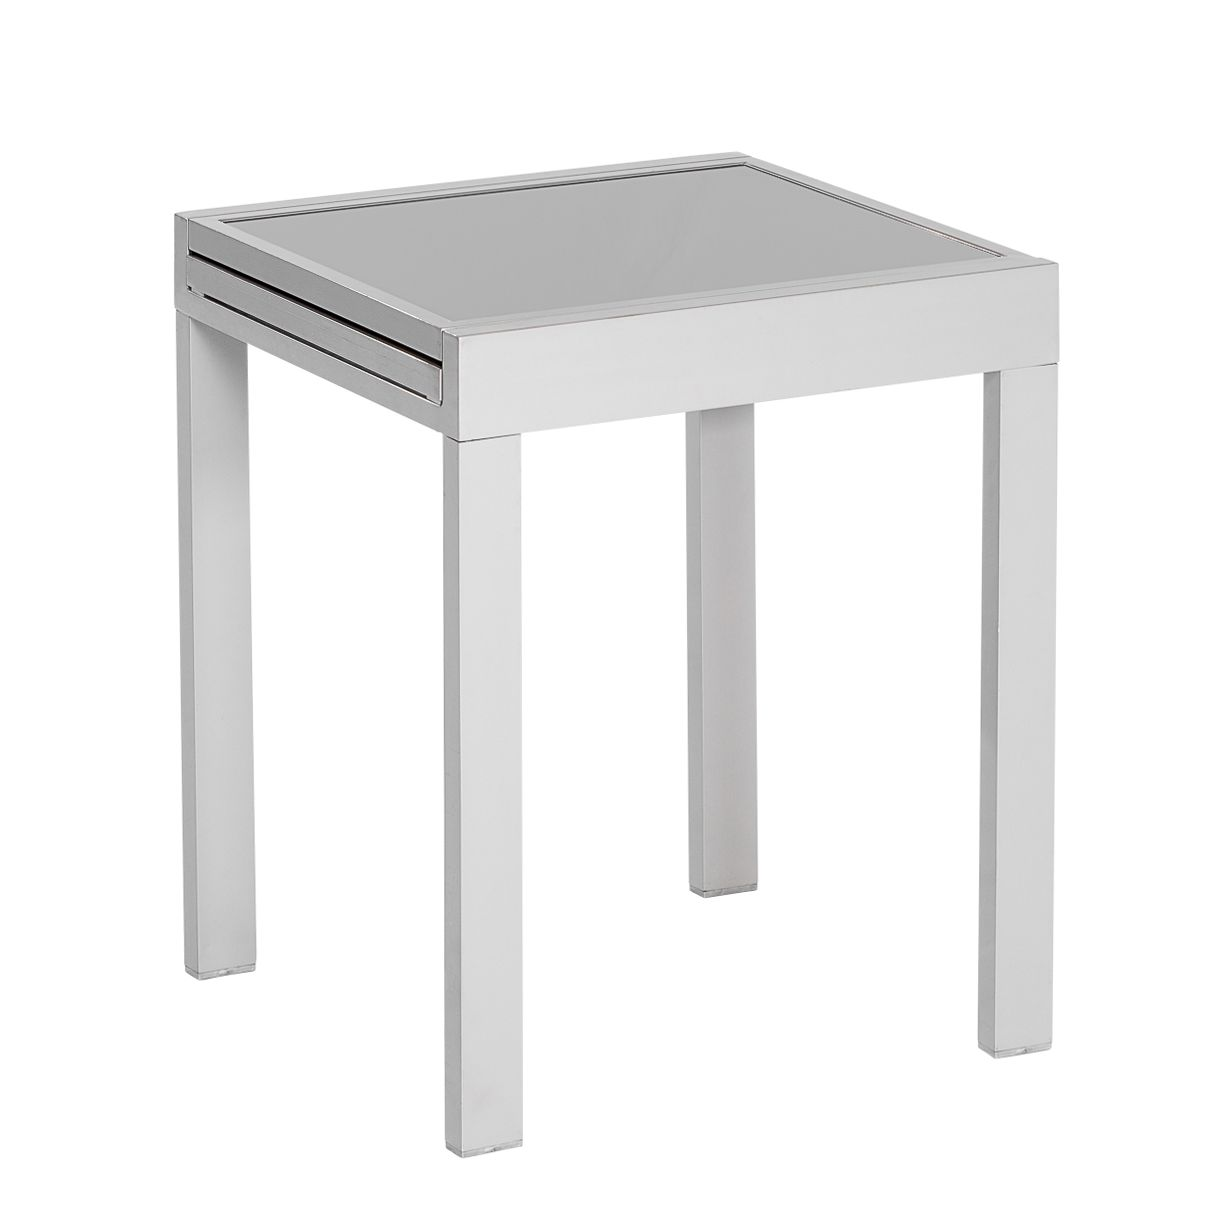 tavolo giardino legno offerte ~ ulicam.net = varie forme di ... - Tavoli Da Giardino In Legno Offerte